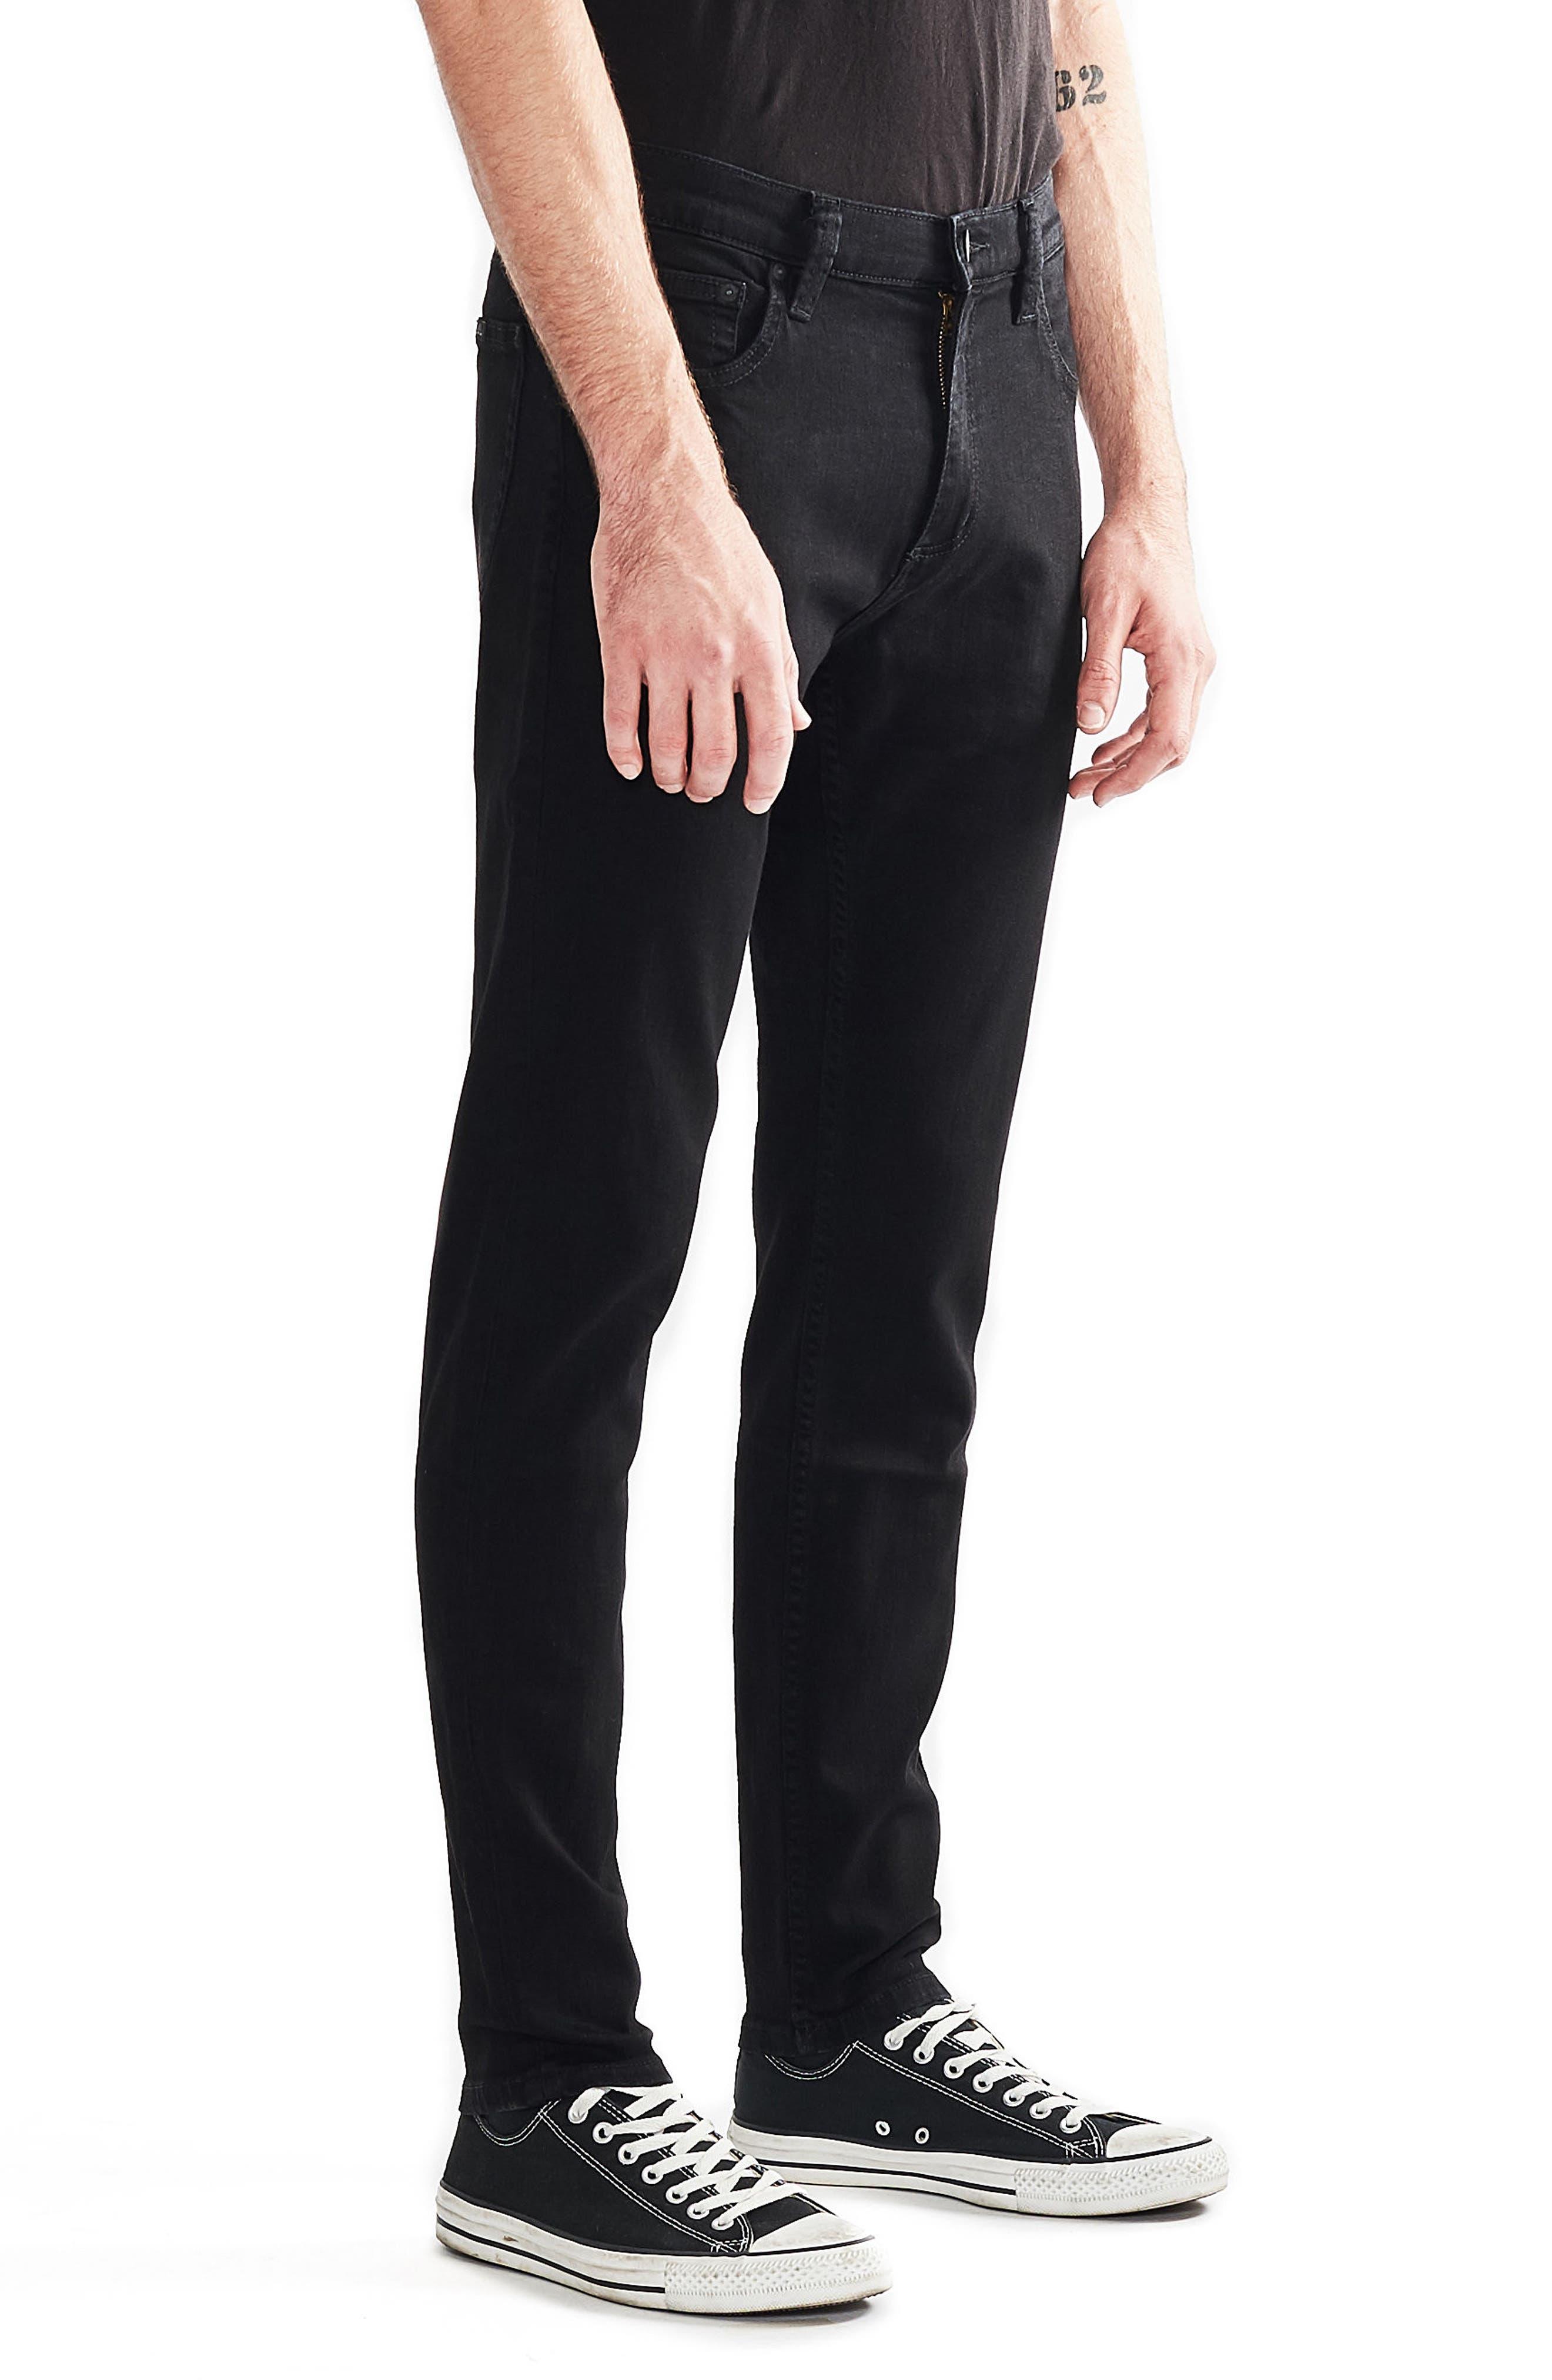 ROLLA'S,                             Stinger Skinny Fit Jeans,                             Alternate thumbnail 3, color,                             BLACK GOLD